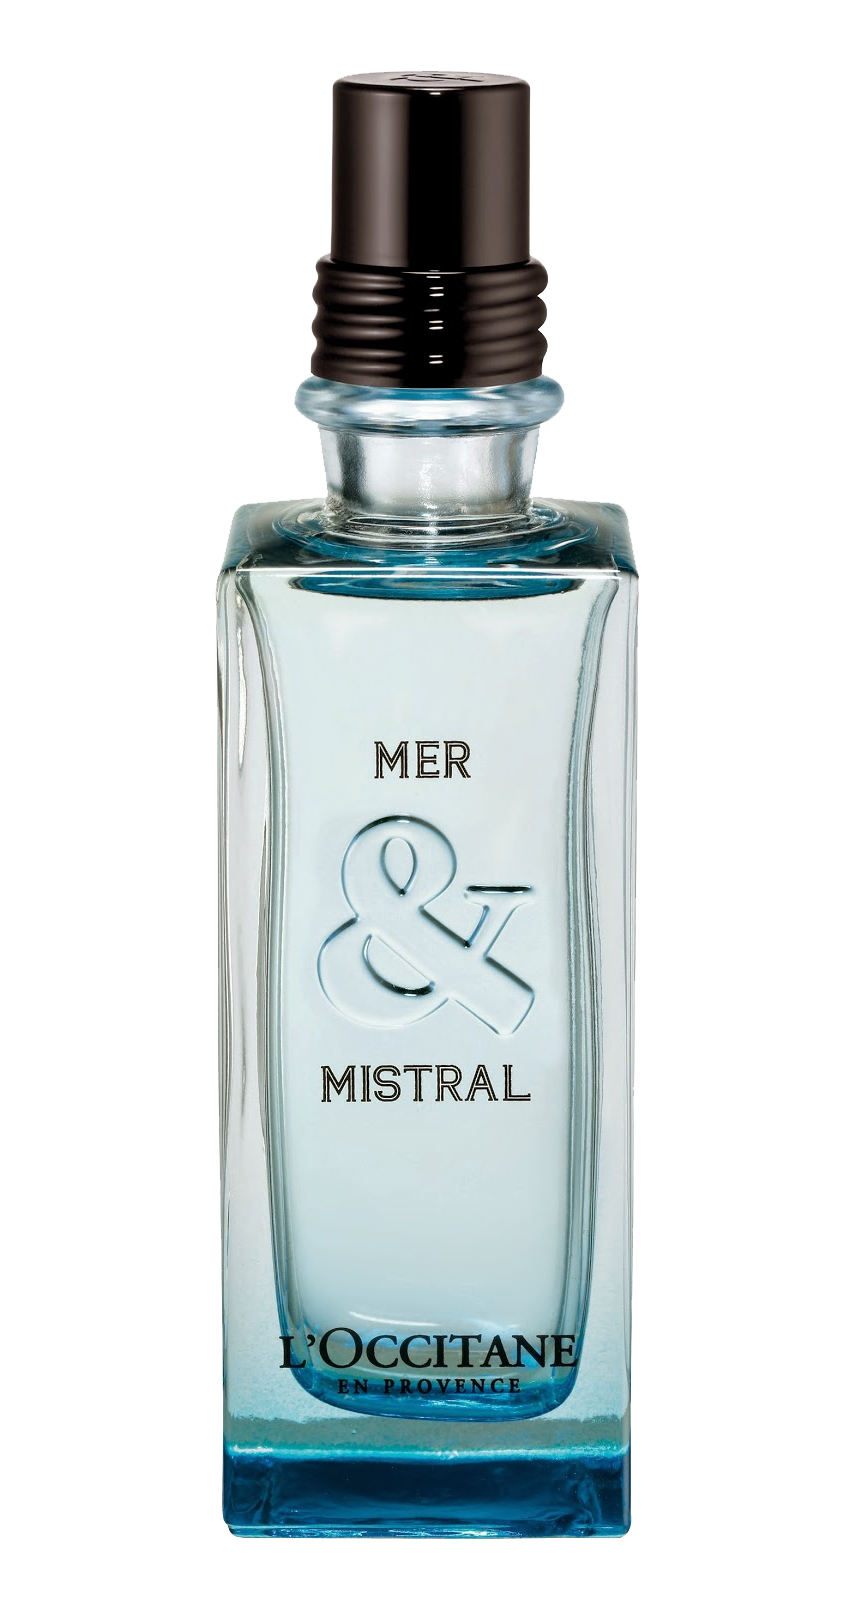 Mer Amp Mistral Loccitane En Provence Perfume A Fragrance For Hermes Terre D Man Flacon H 2014 Parfum 75 Ml Women And Men Pictures